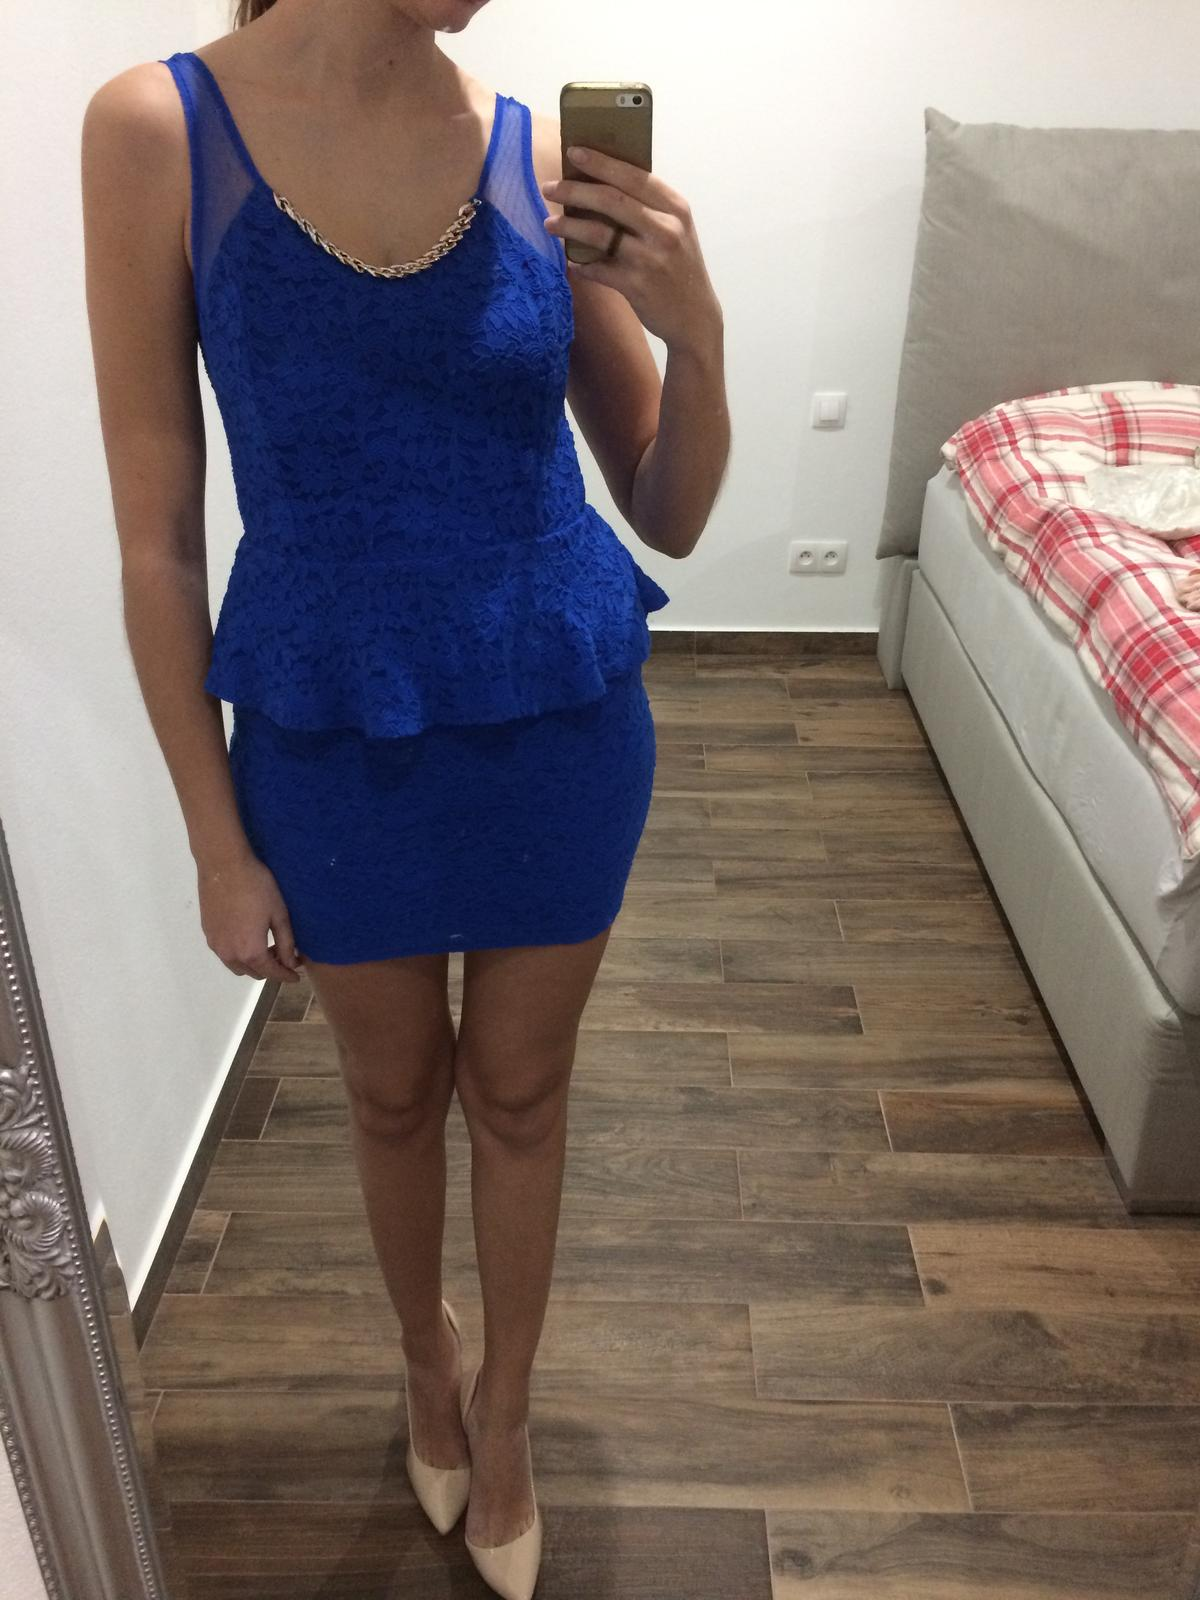 Kráľovsky modré čipkované šaty - Obrázok č. 1